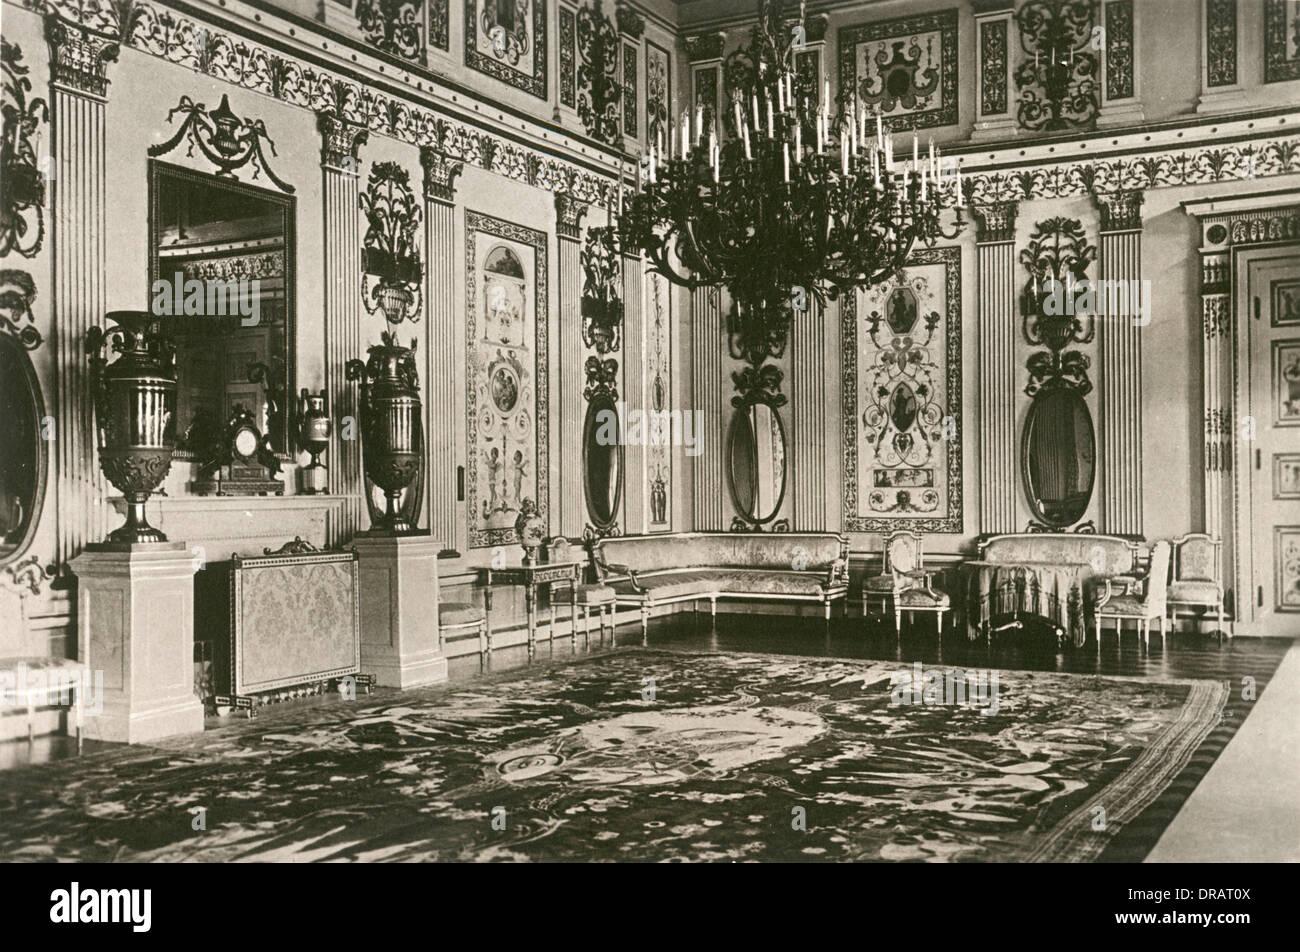 Arabesque Drawing Room, Catherine Palace, Tsarkoe Selo - Stock Image